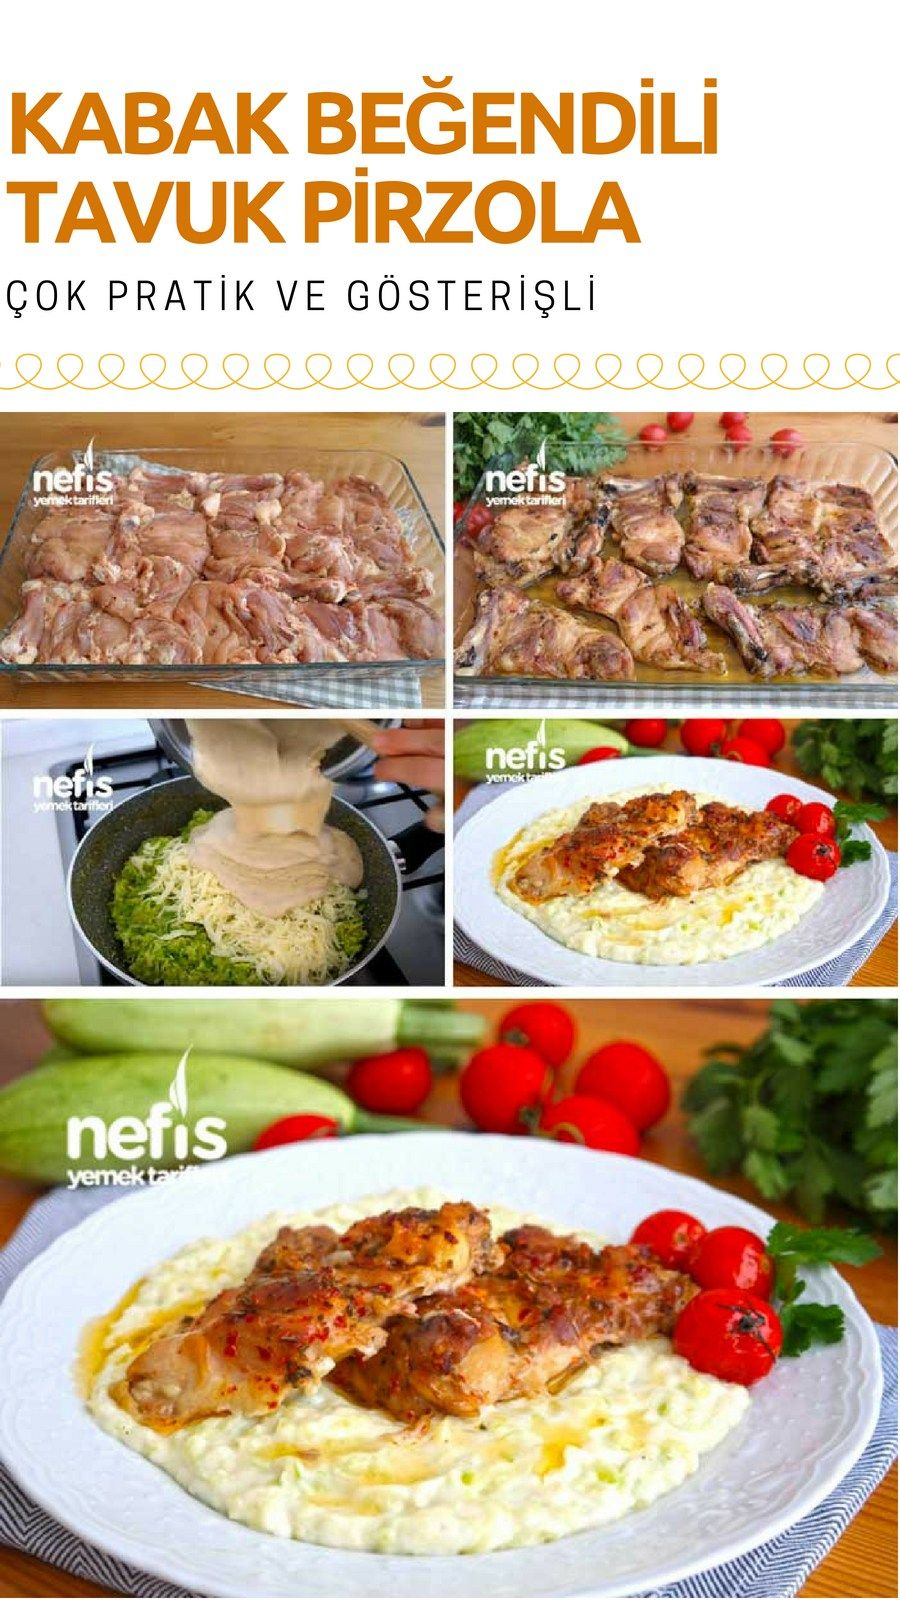 Fırında Patatesli Tavuk Pirzola Tarifi Videosu